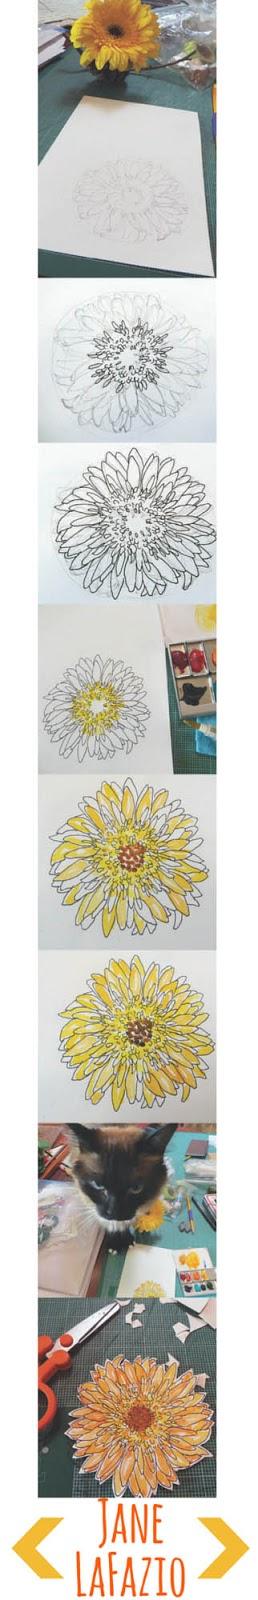 http://3.bp.blogspot.com/-oEryLjrithg/VdI-Qic5N2I/AAAAAAAANkA/rZDcLPPJzE0/s1600/flower%2Btute.jpg